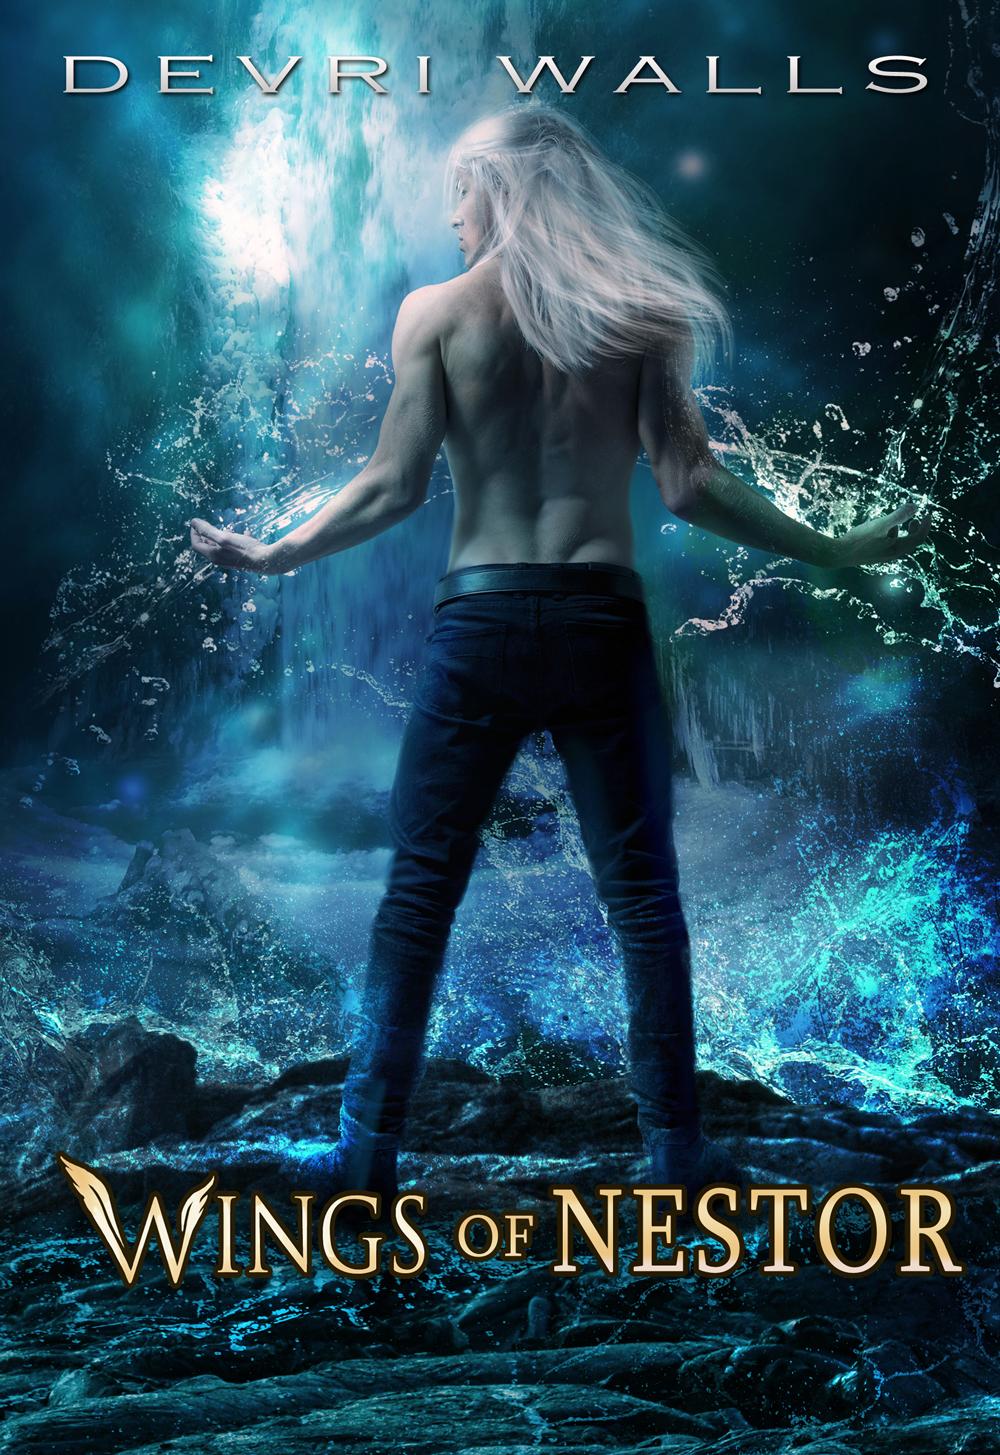 Wings of Nestor Book Cover